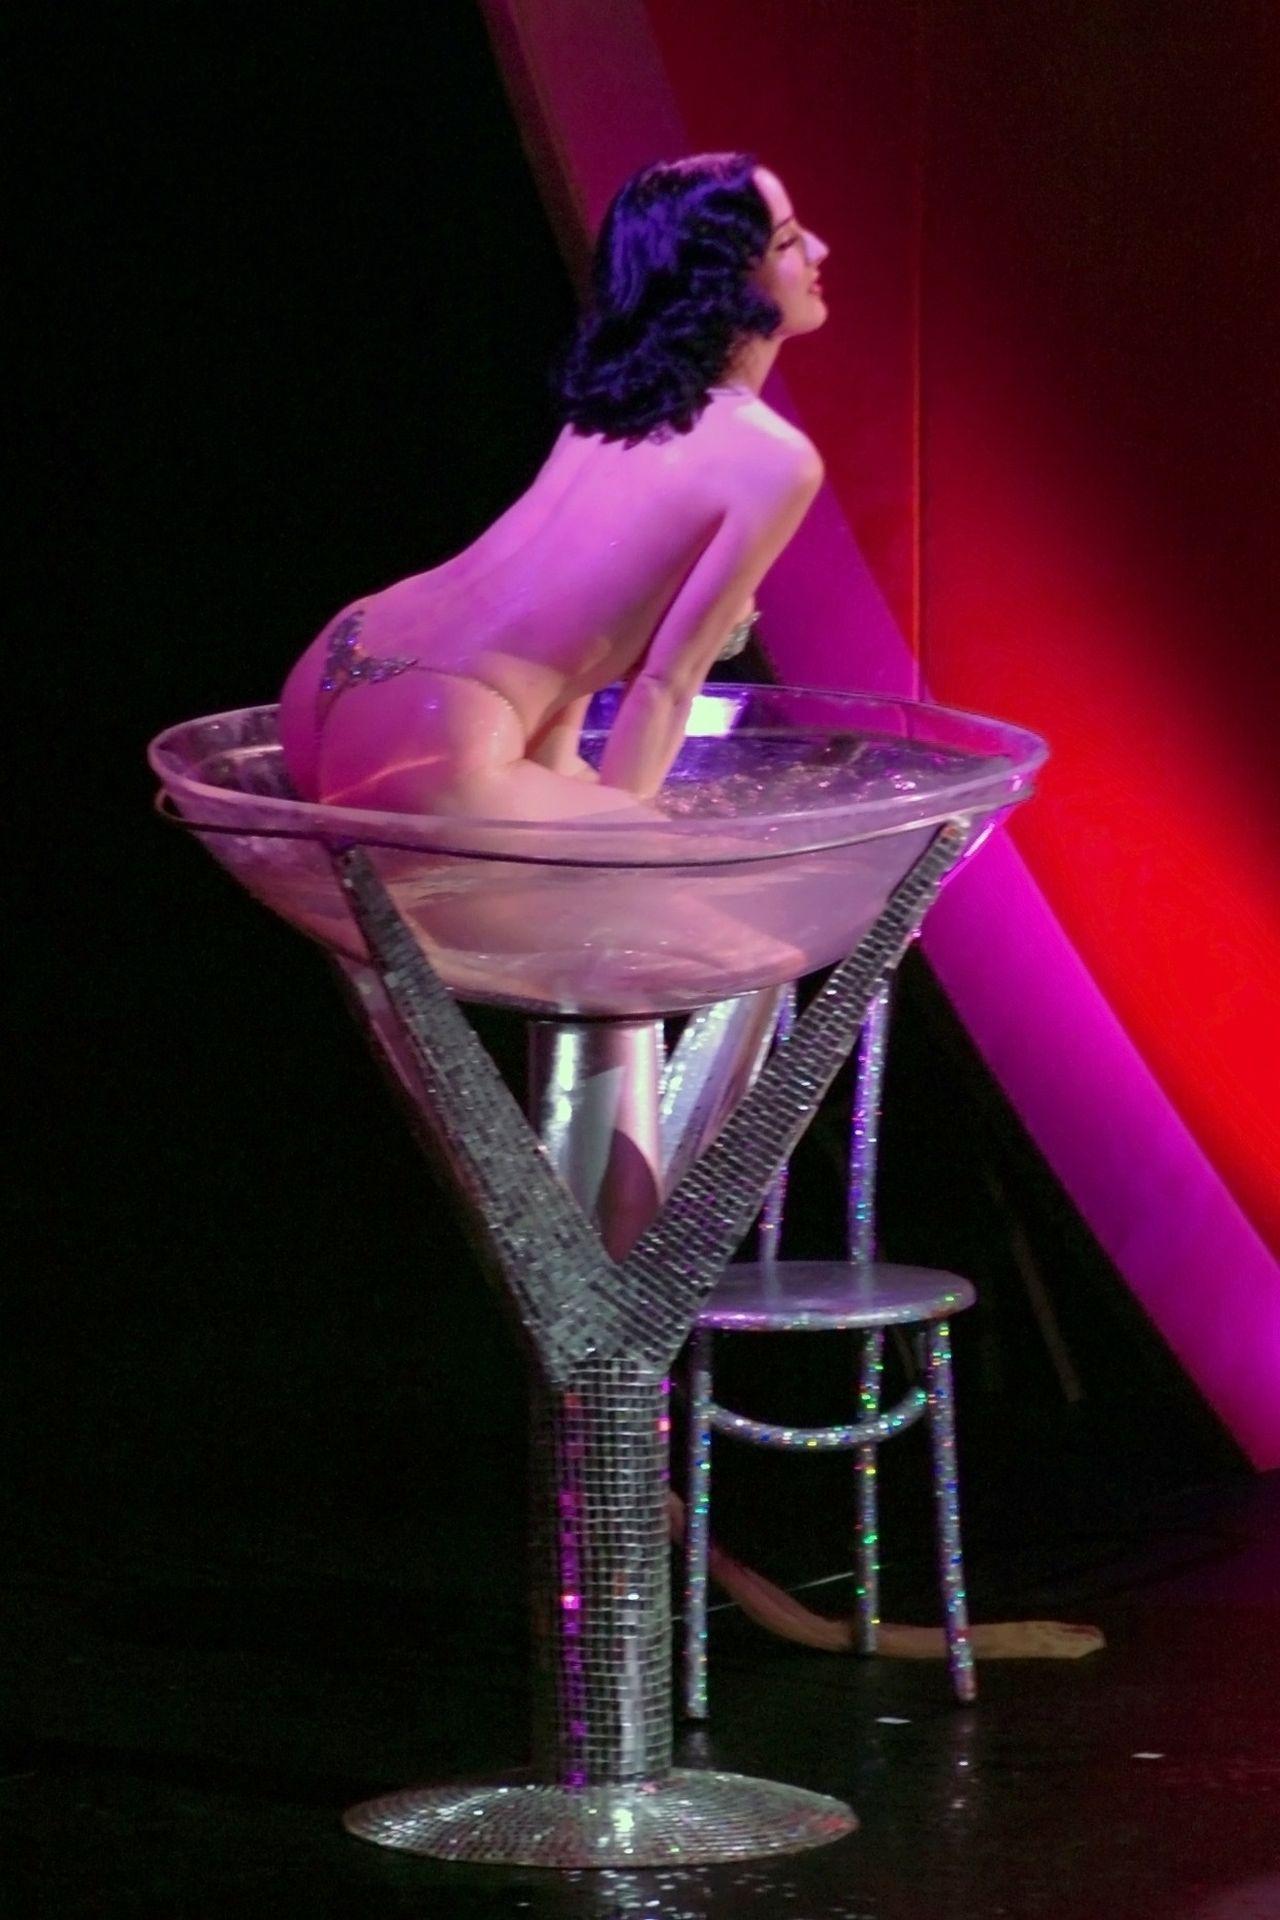 Dita Von Teese Performs At Erotica 06 In London 0038